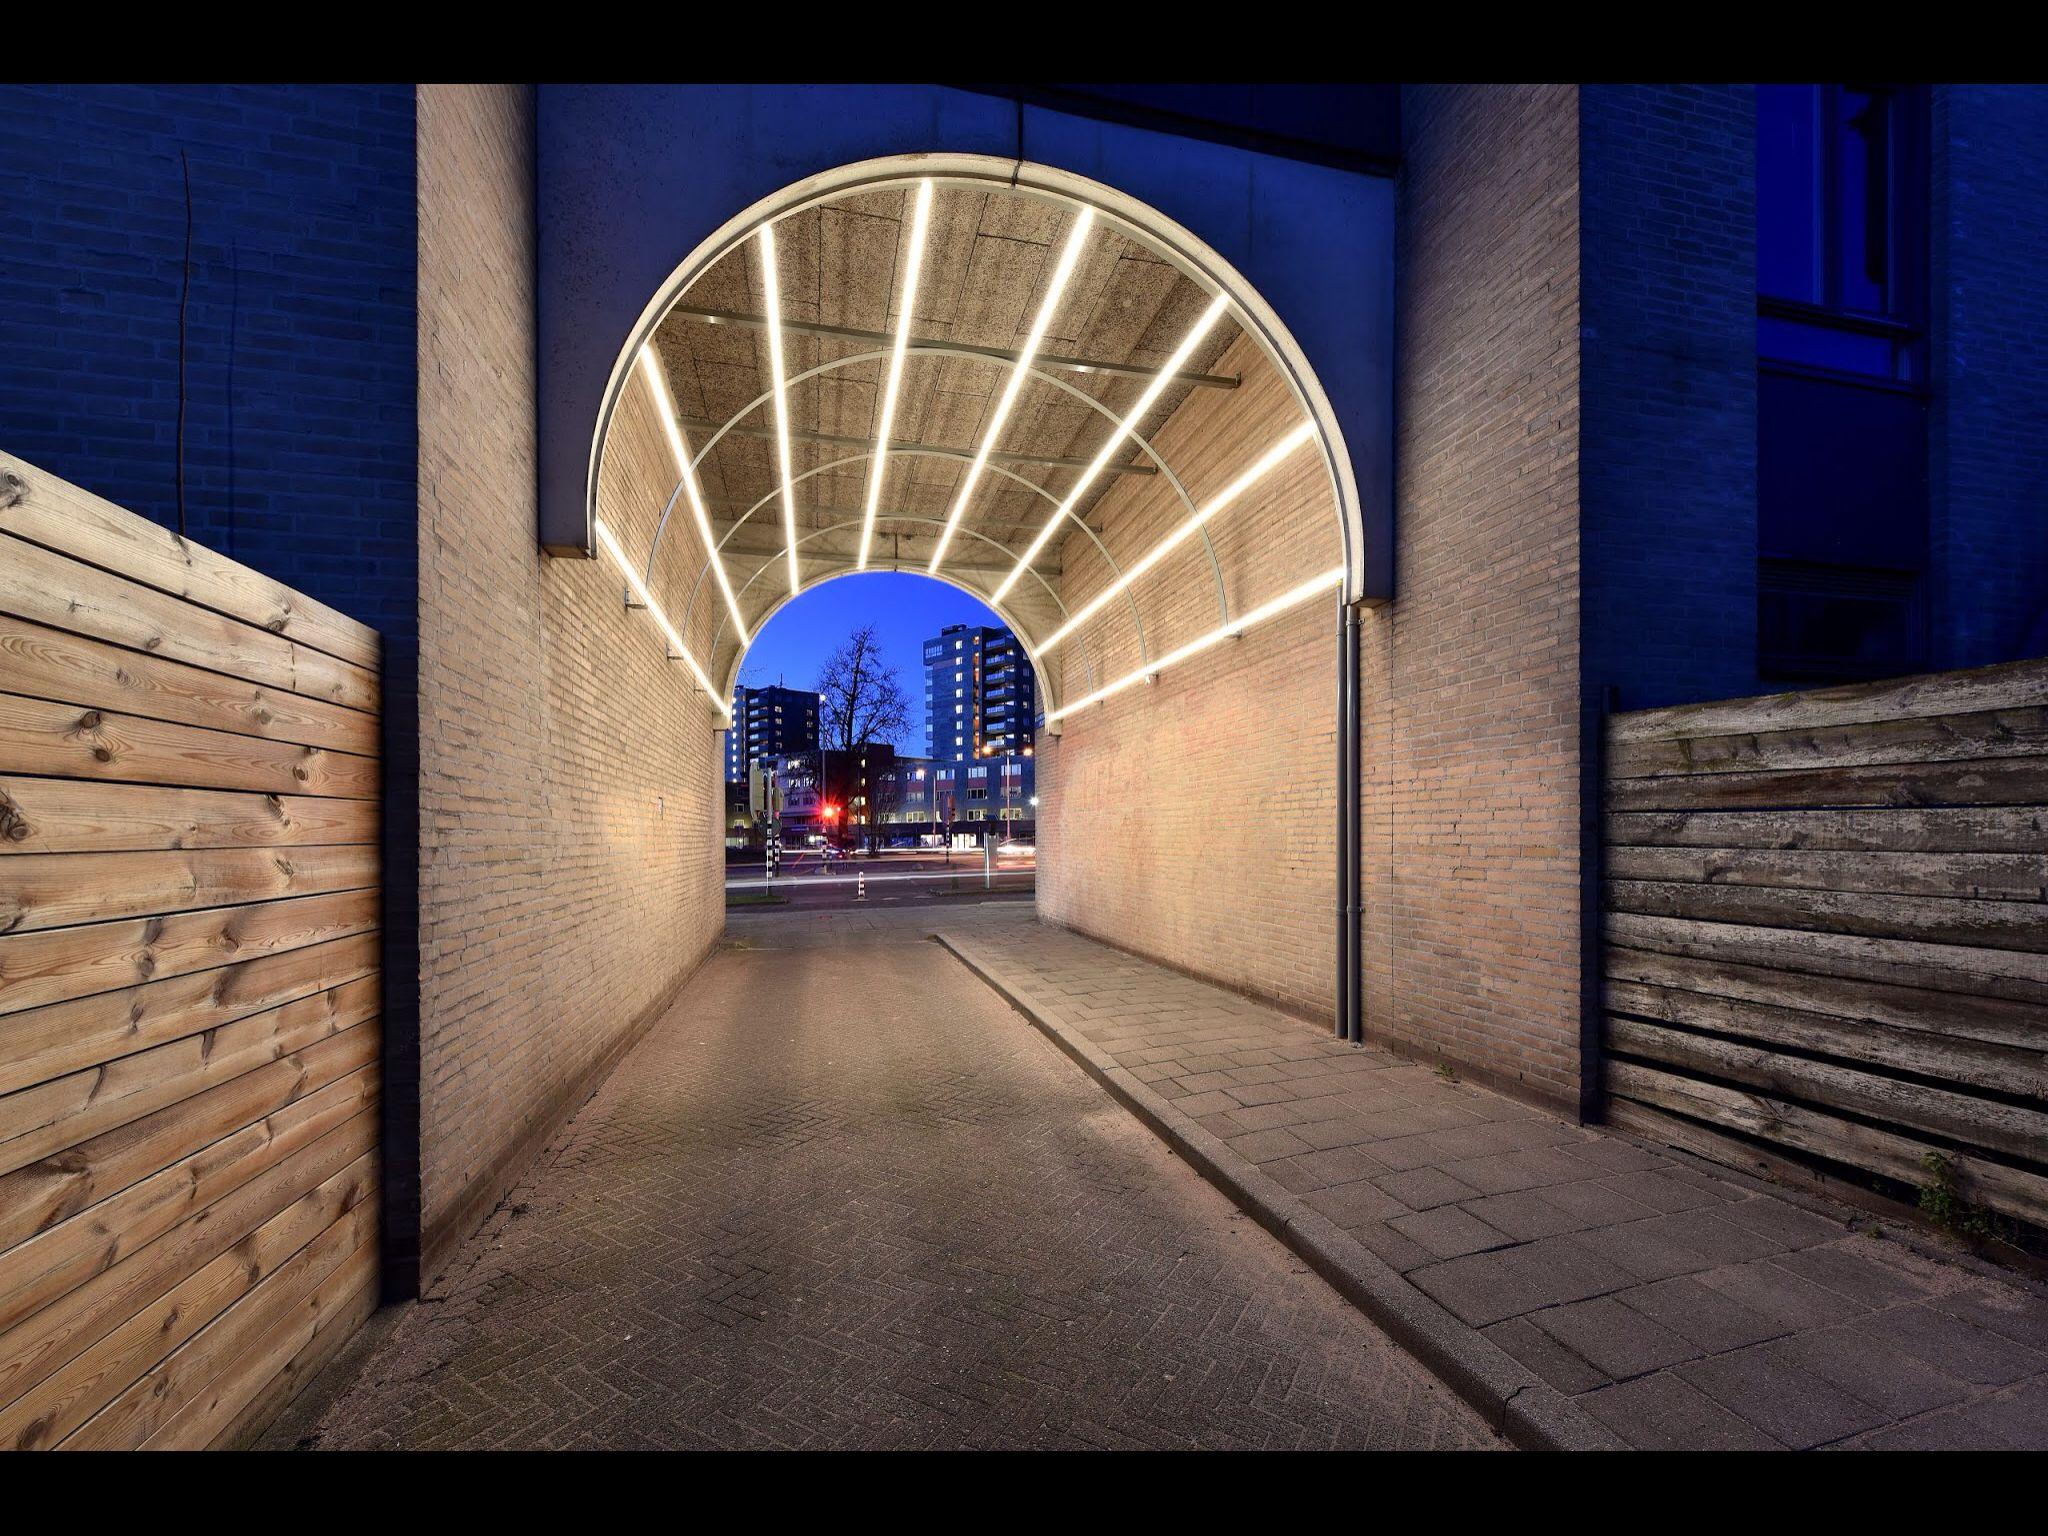 Tunnel Nijmegen, The Netherlands 2